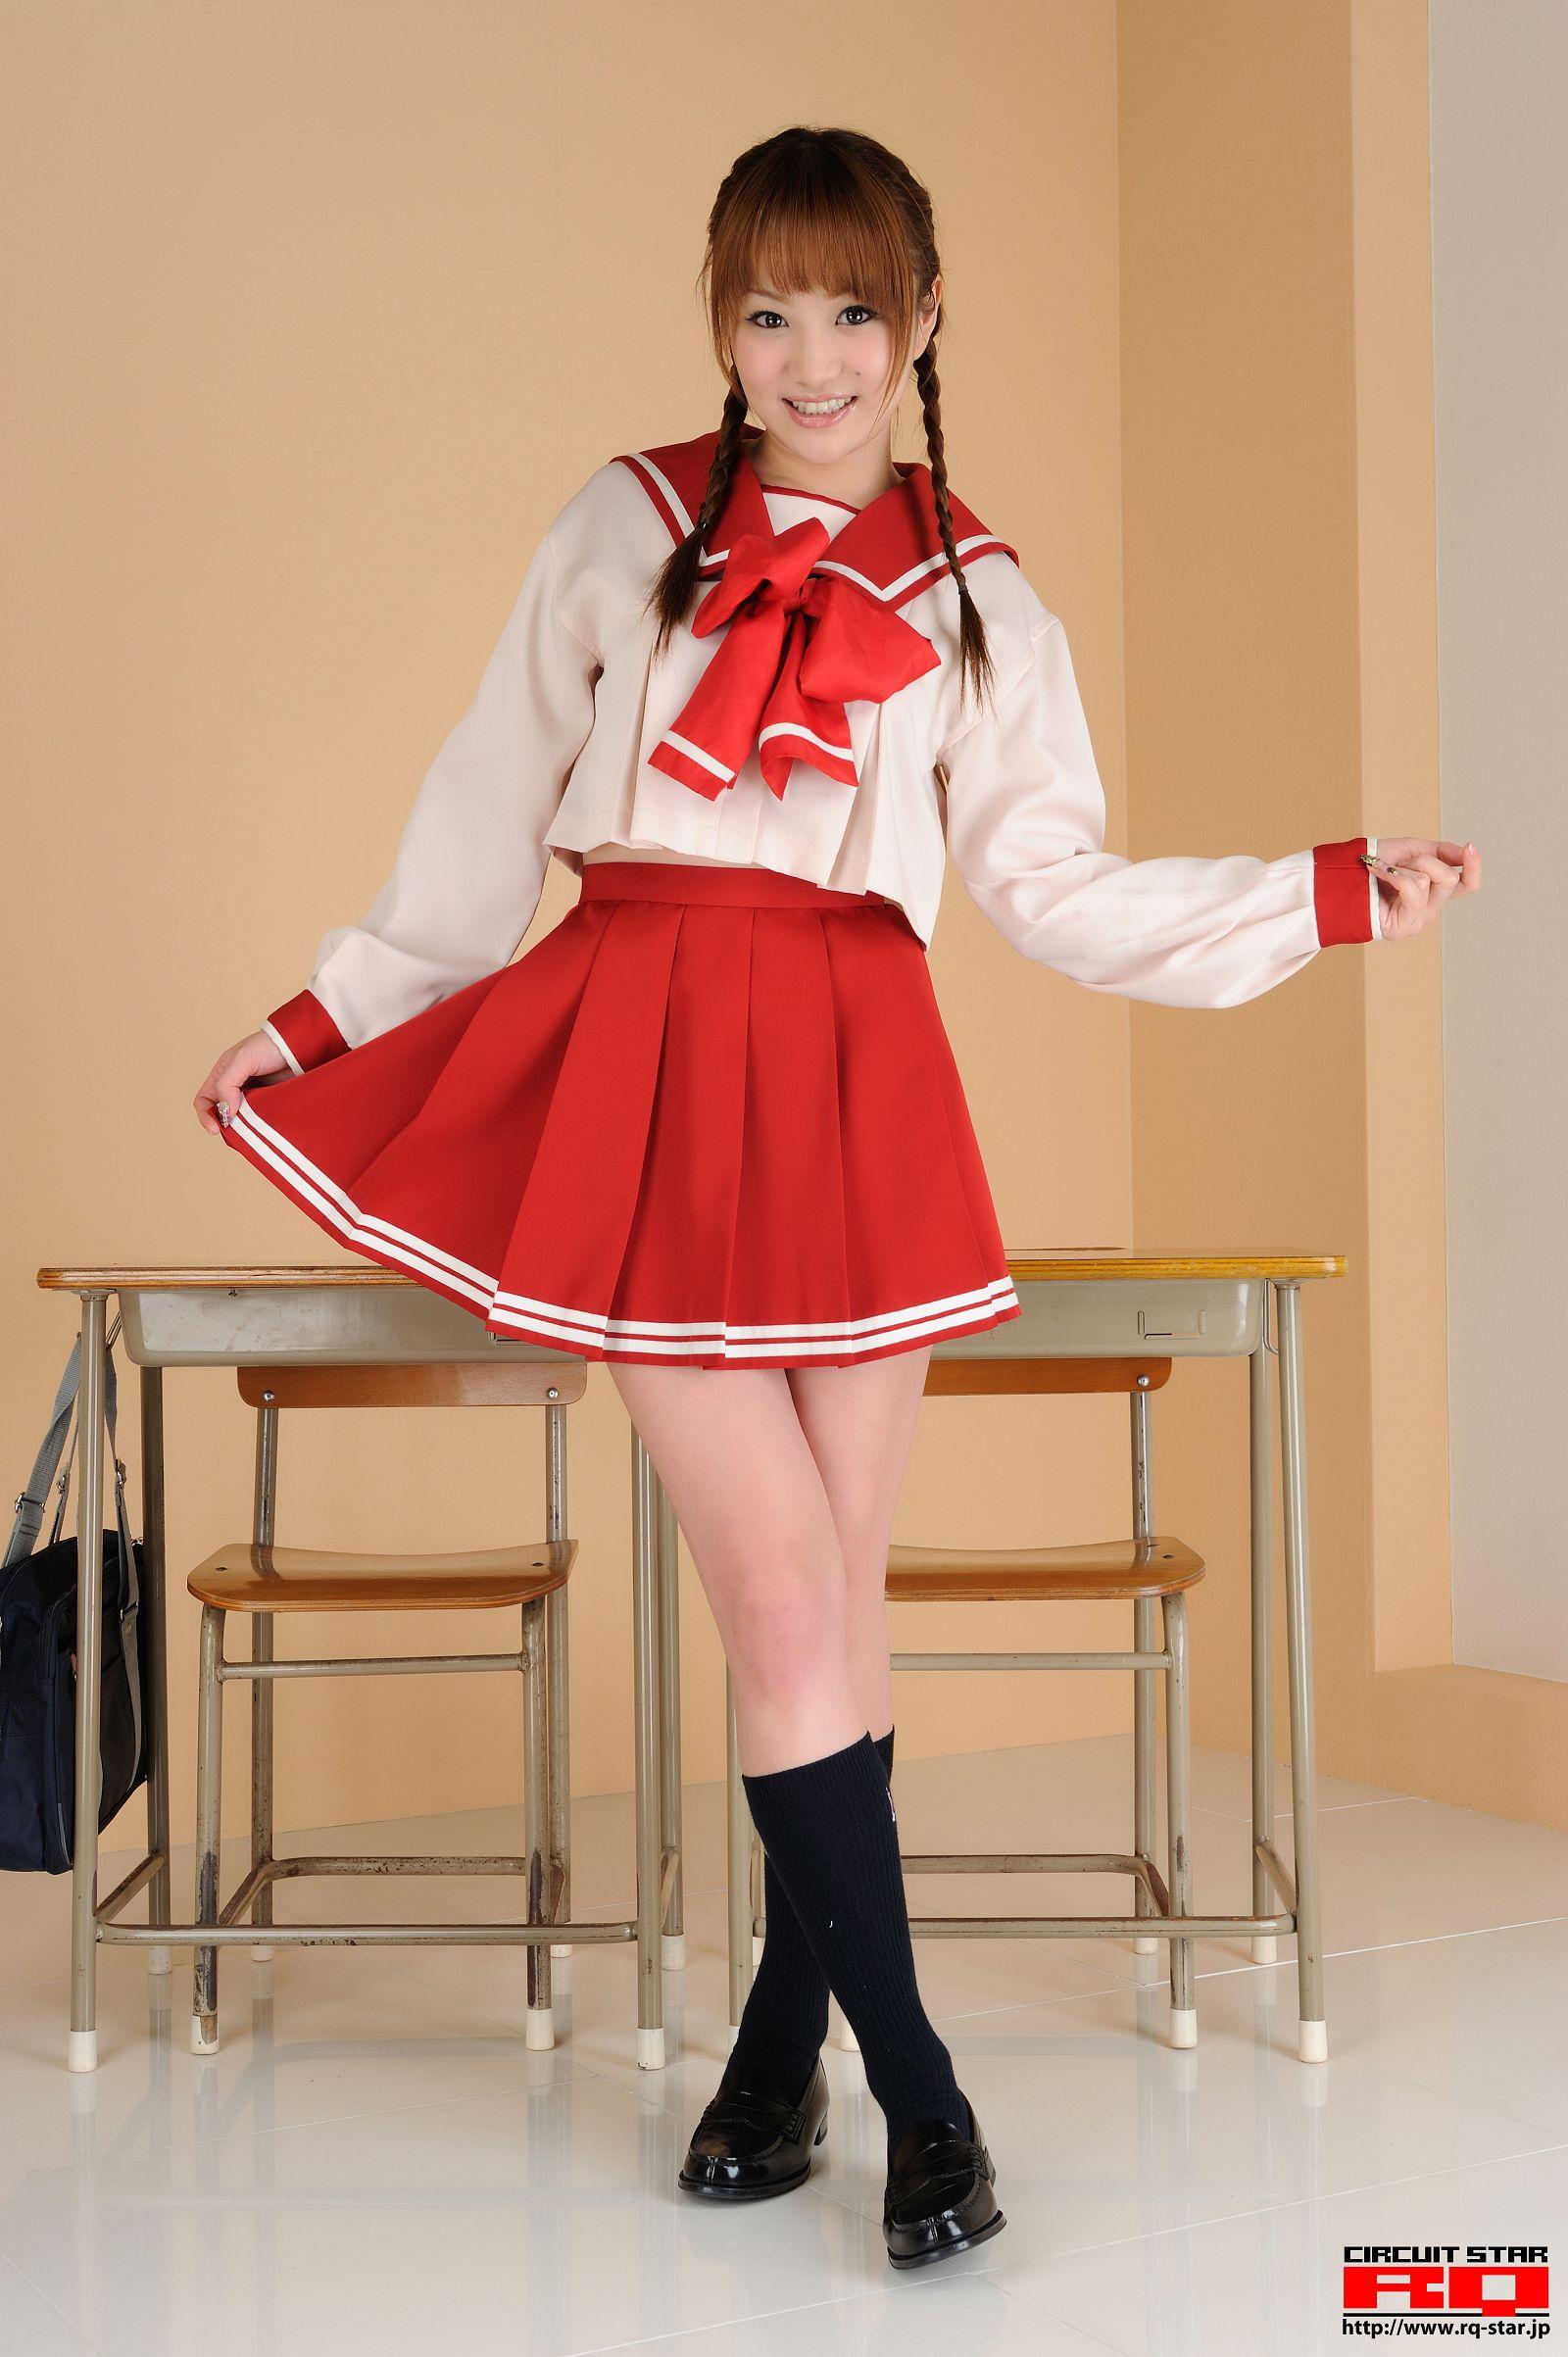 [RQ STAR美女] NO.00452 Yurika Aoi 葵ゆりか Sailor Style[77P] RQ STAR 第1张